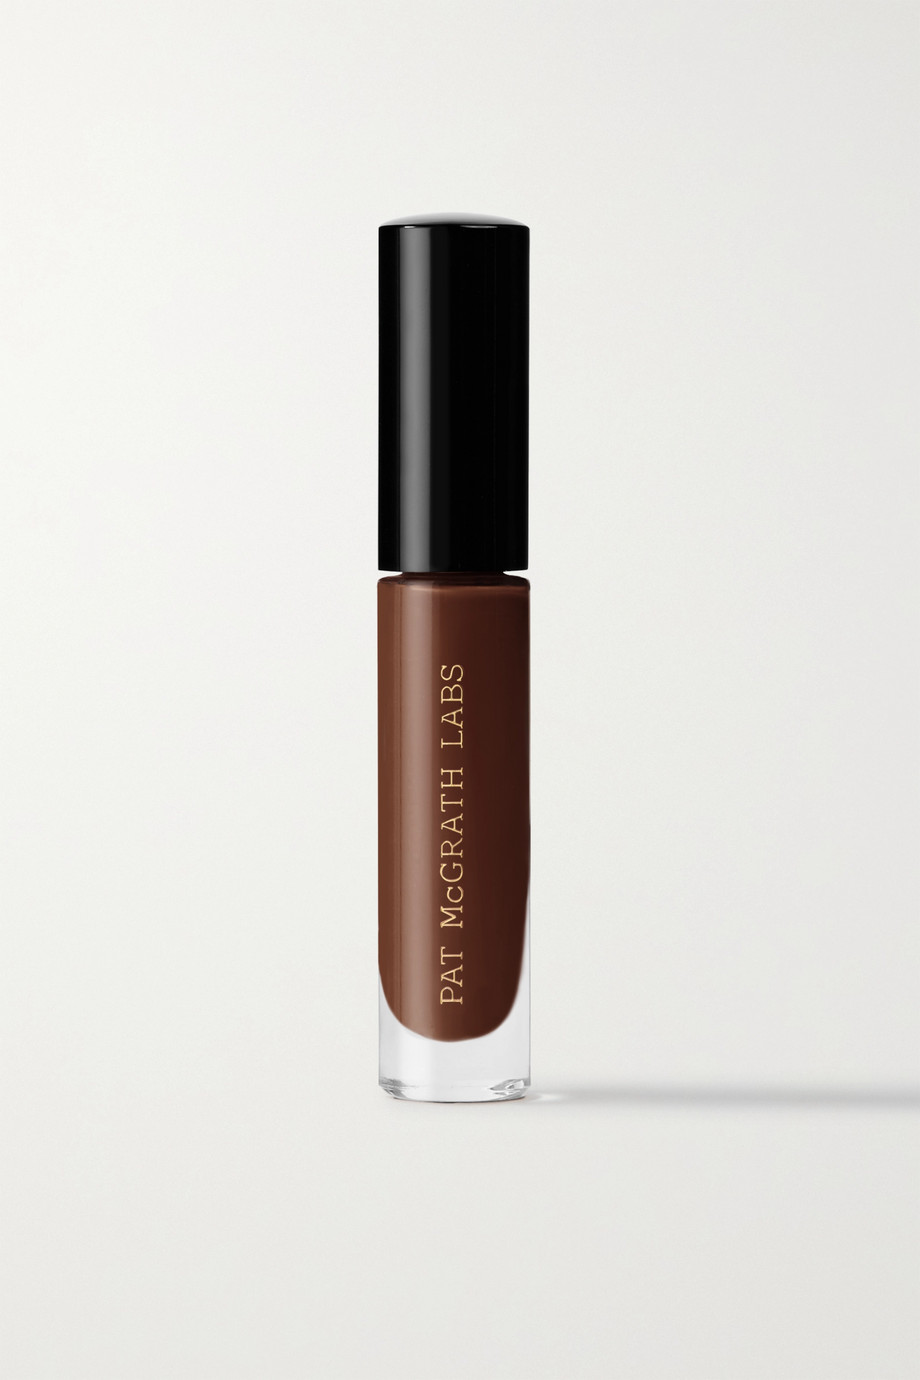 Pat McGrath Labs Skin Fetish: Sublime Perfection Concealer - D34, 5ml